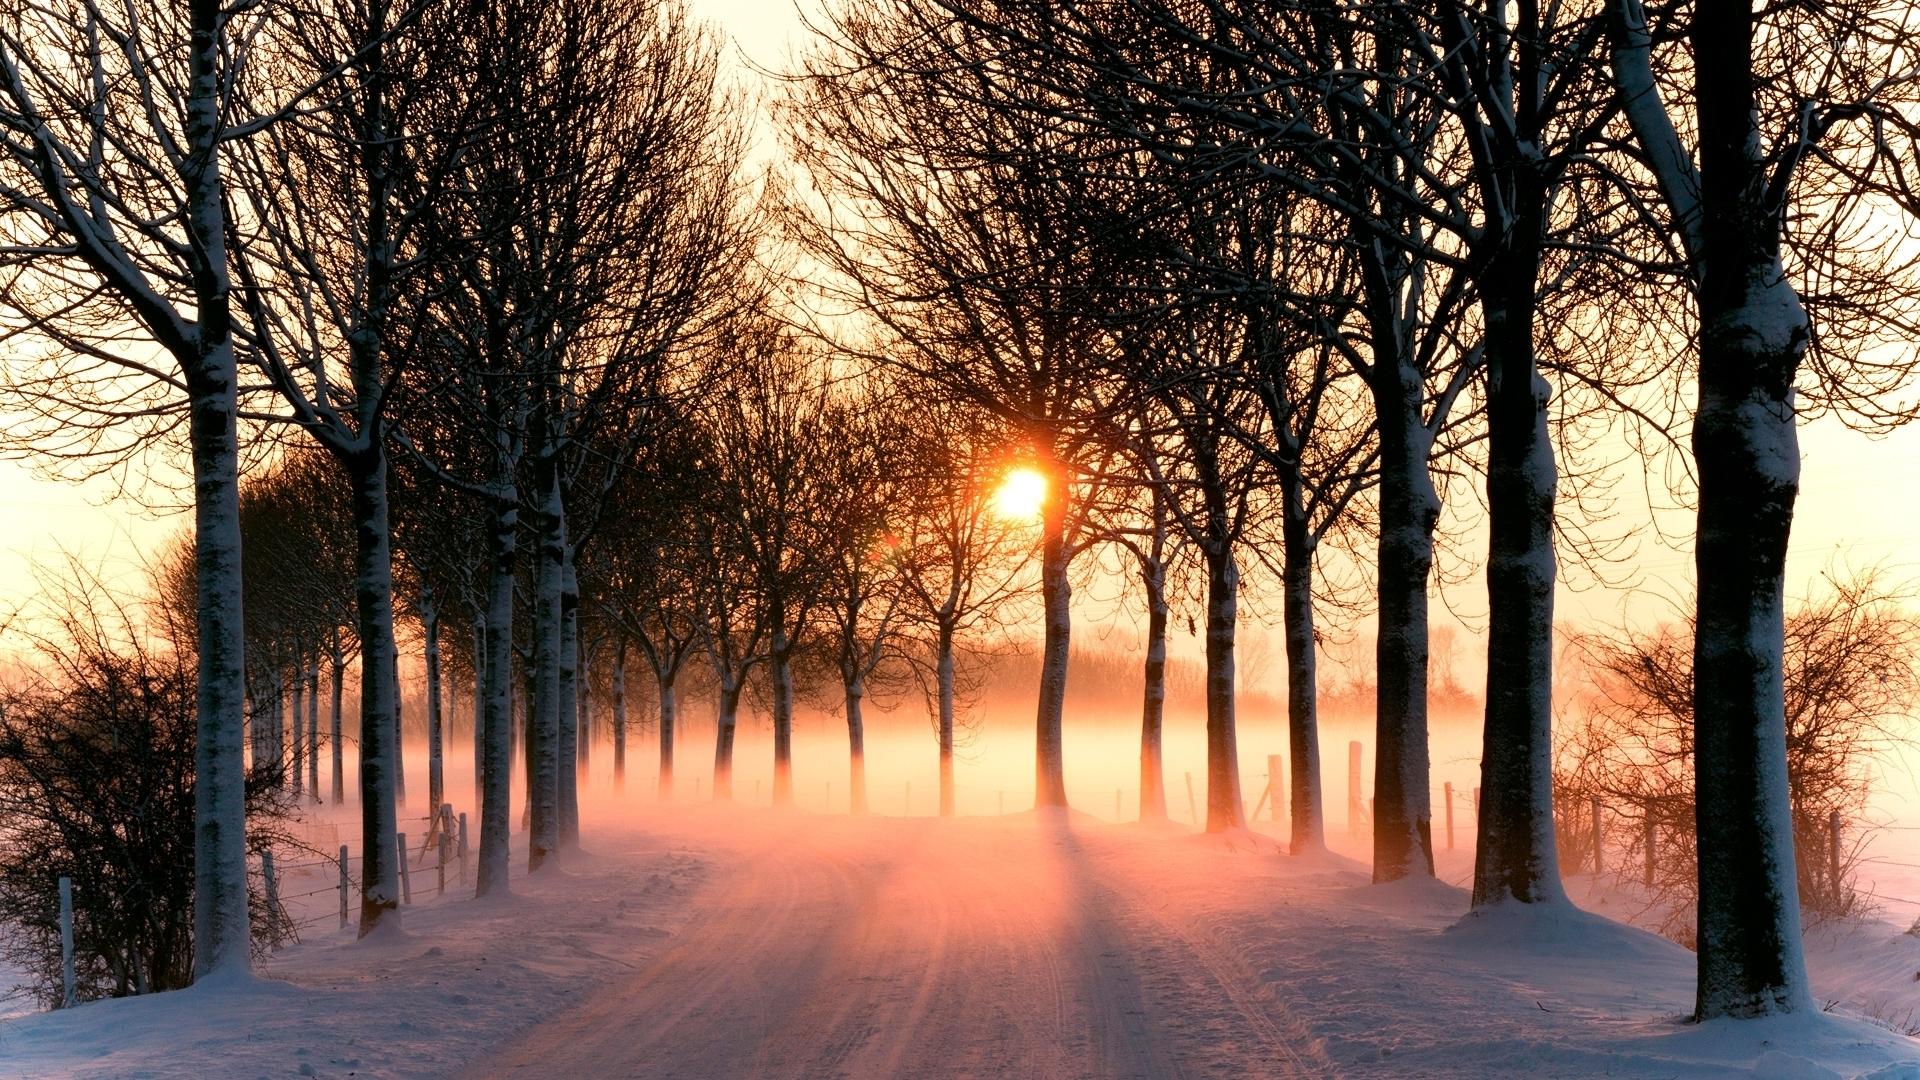 towards the snowy - photo #8